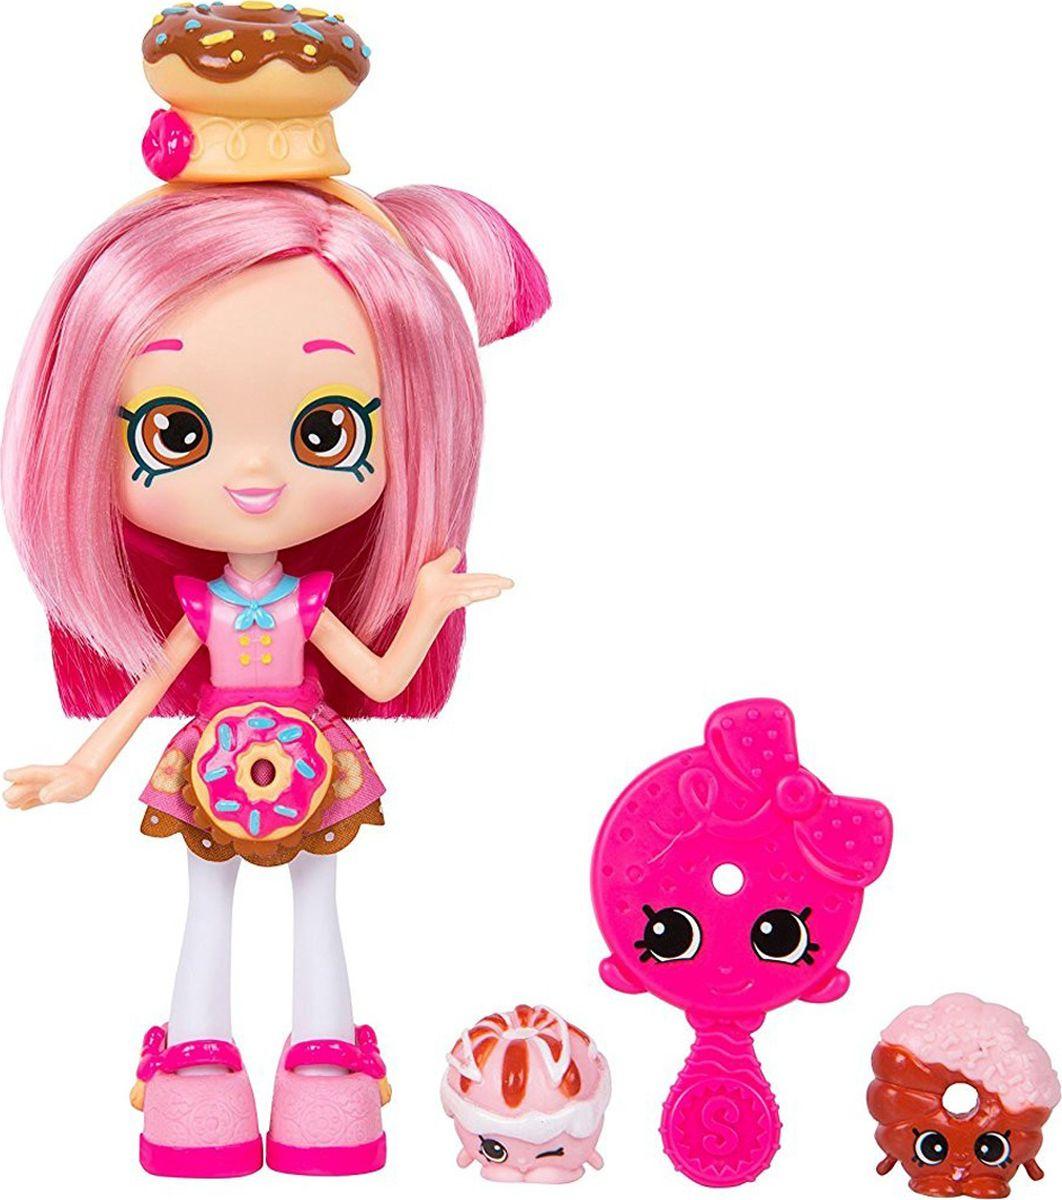 Shopkins Мини-кукла Shoppies Donatina куклы с черными волосами